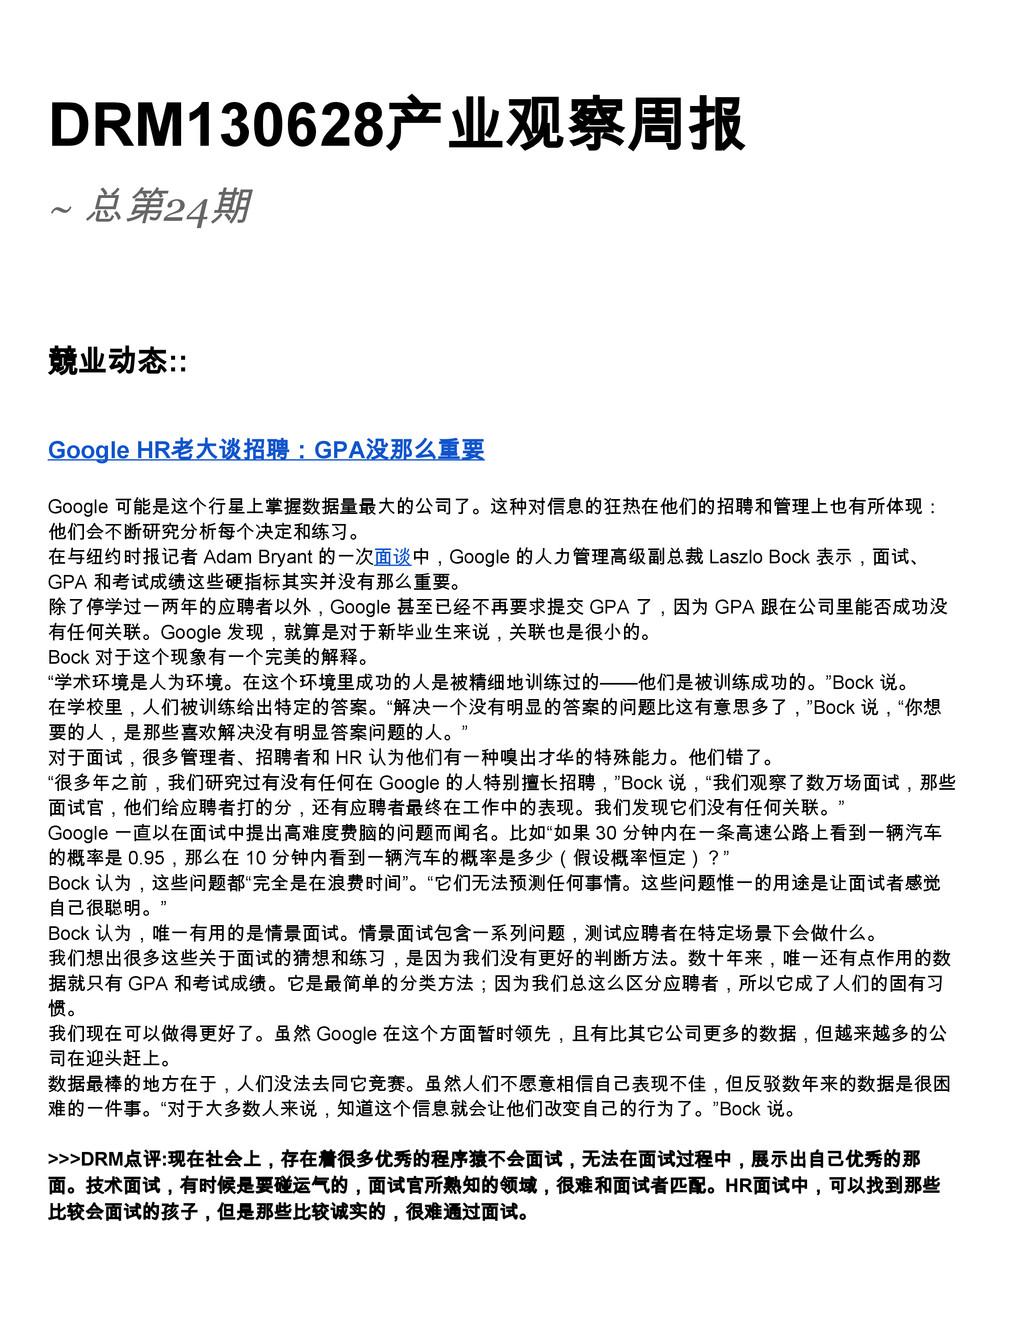 DRM130628产业观察周报 ~ 总第24期 競业动态:: Google HR老大谈招聘:G...